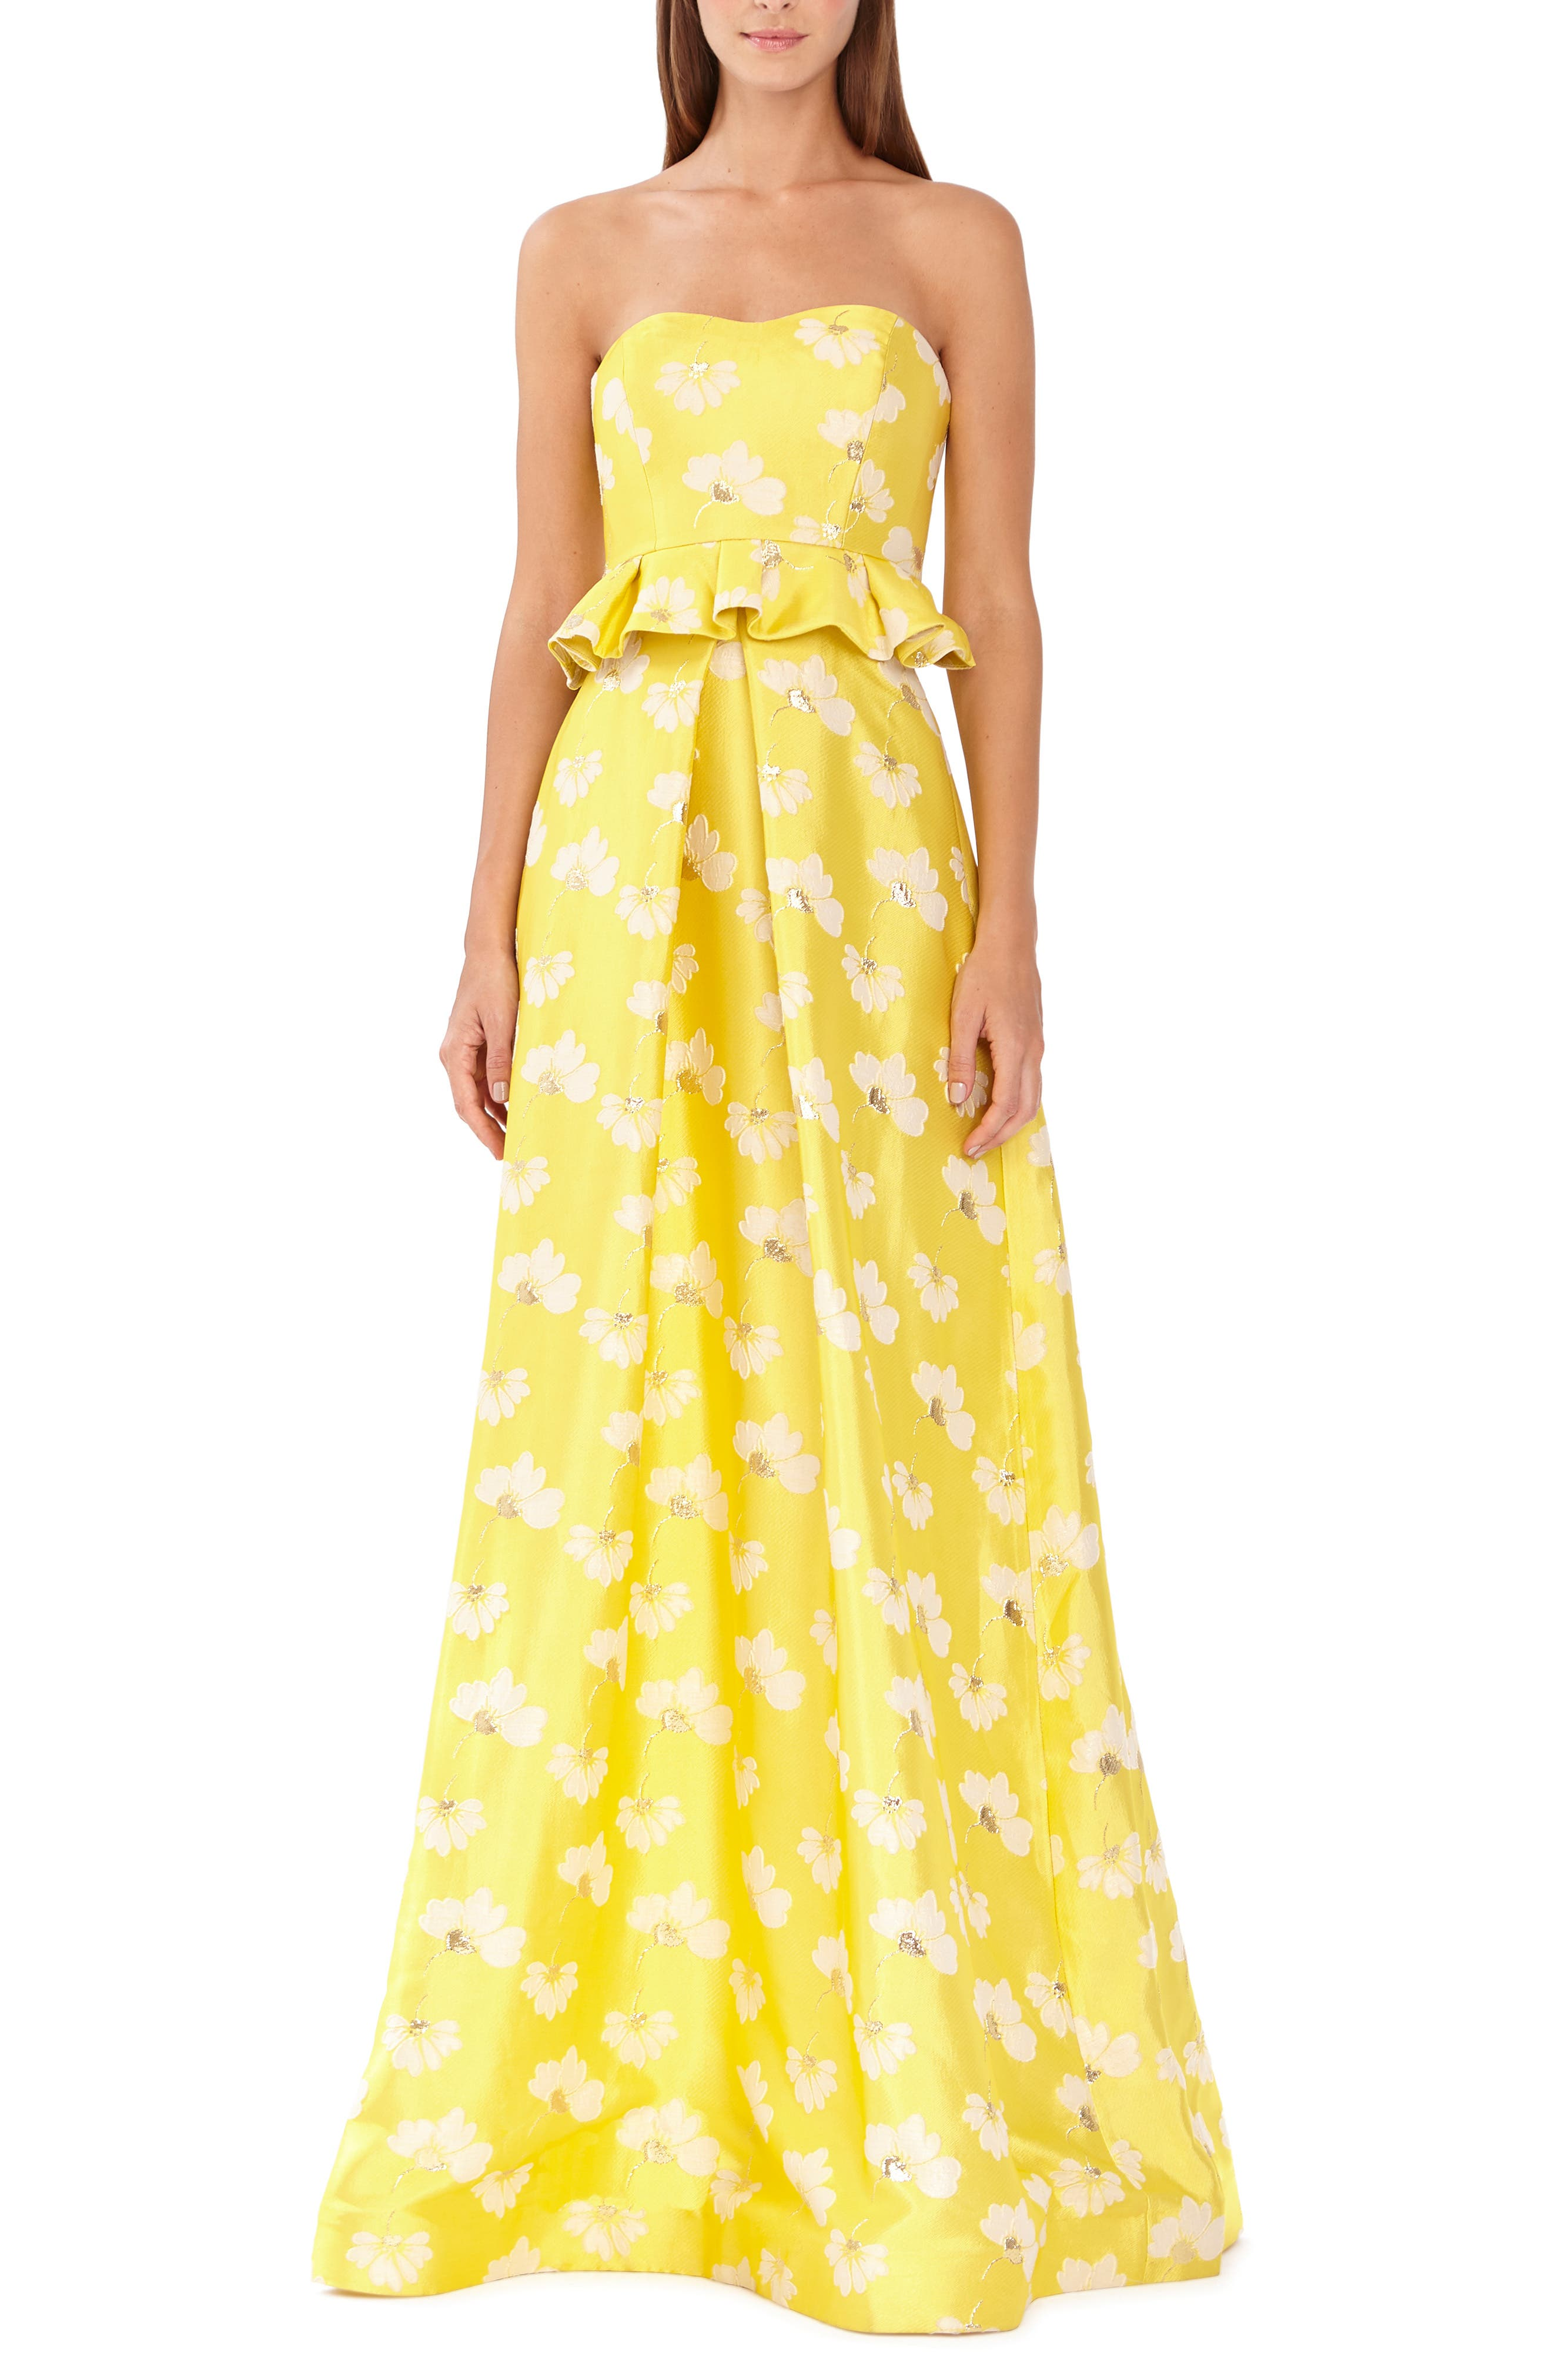 Ml Monique Lhuillier Strapless Floral Jacquard Gown, Yellow